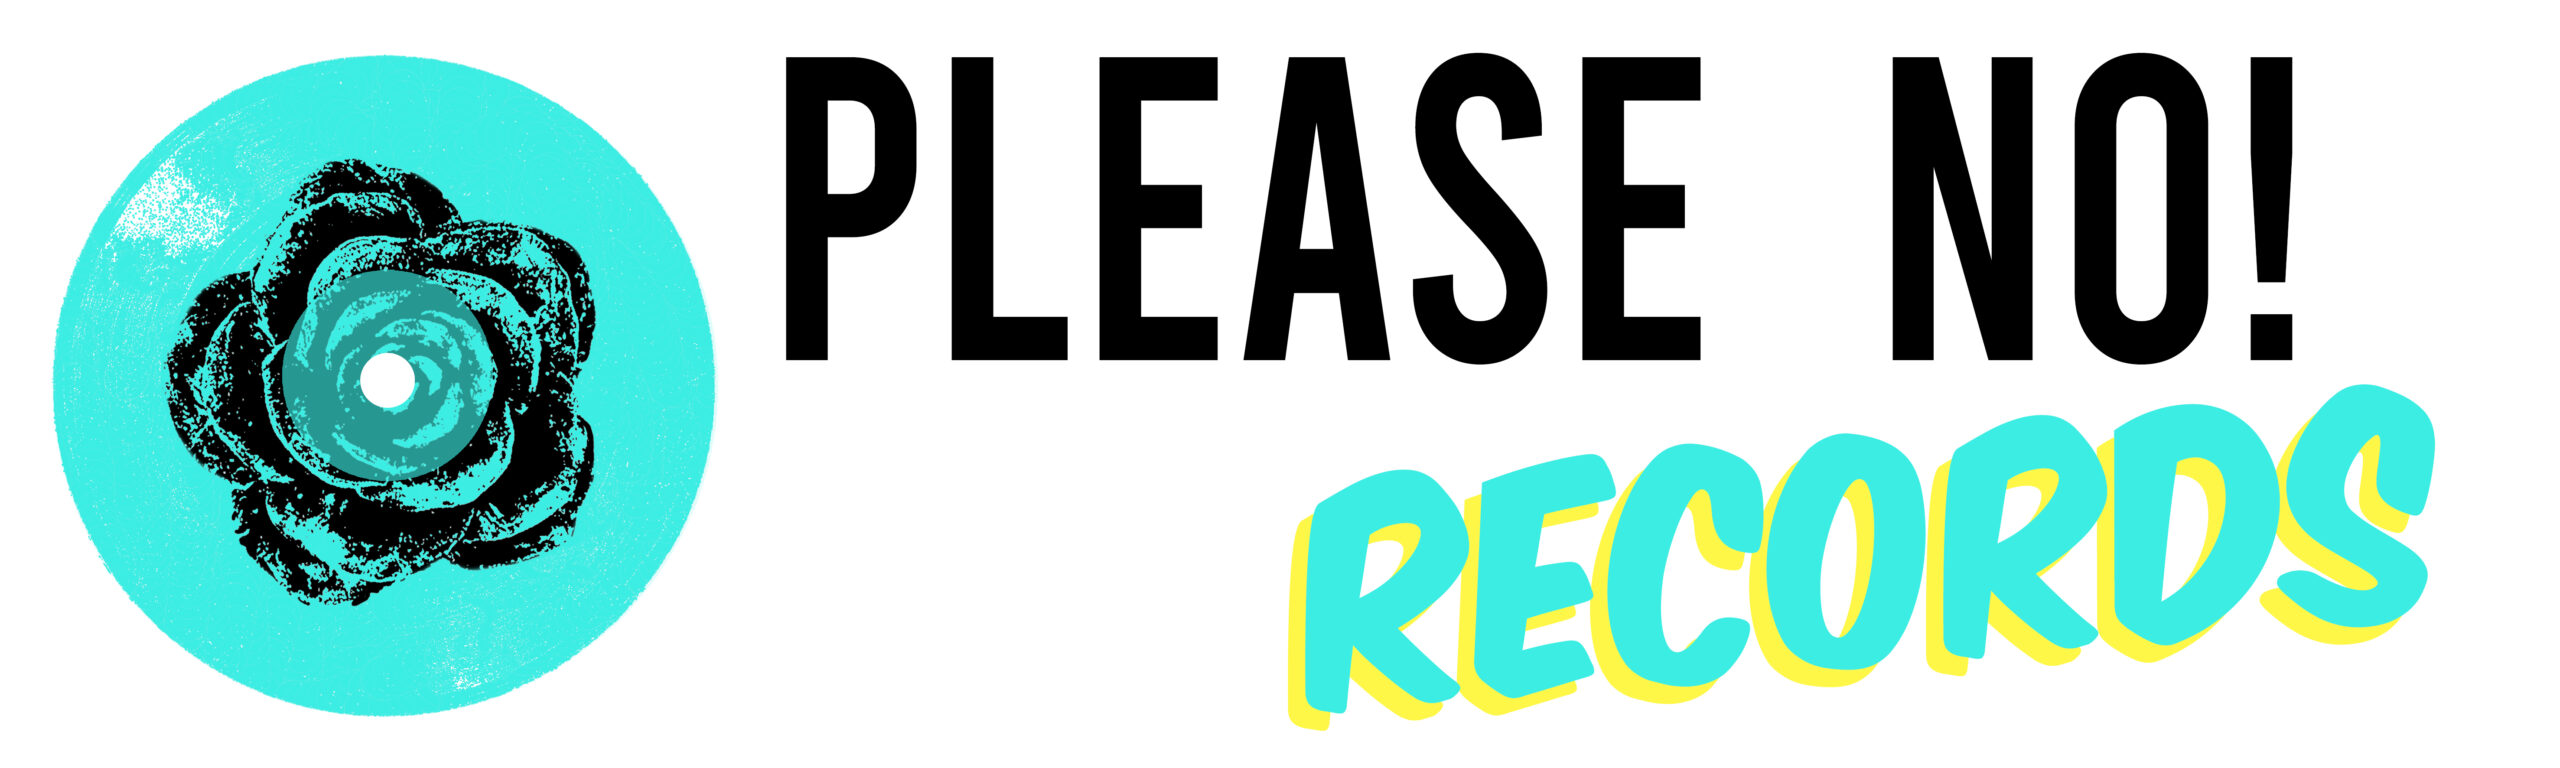 PLEASE NO! RECORDS